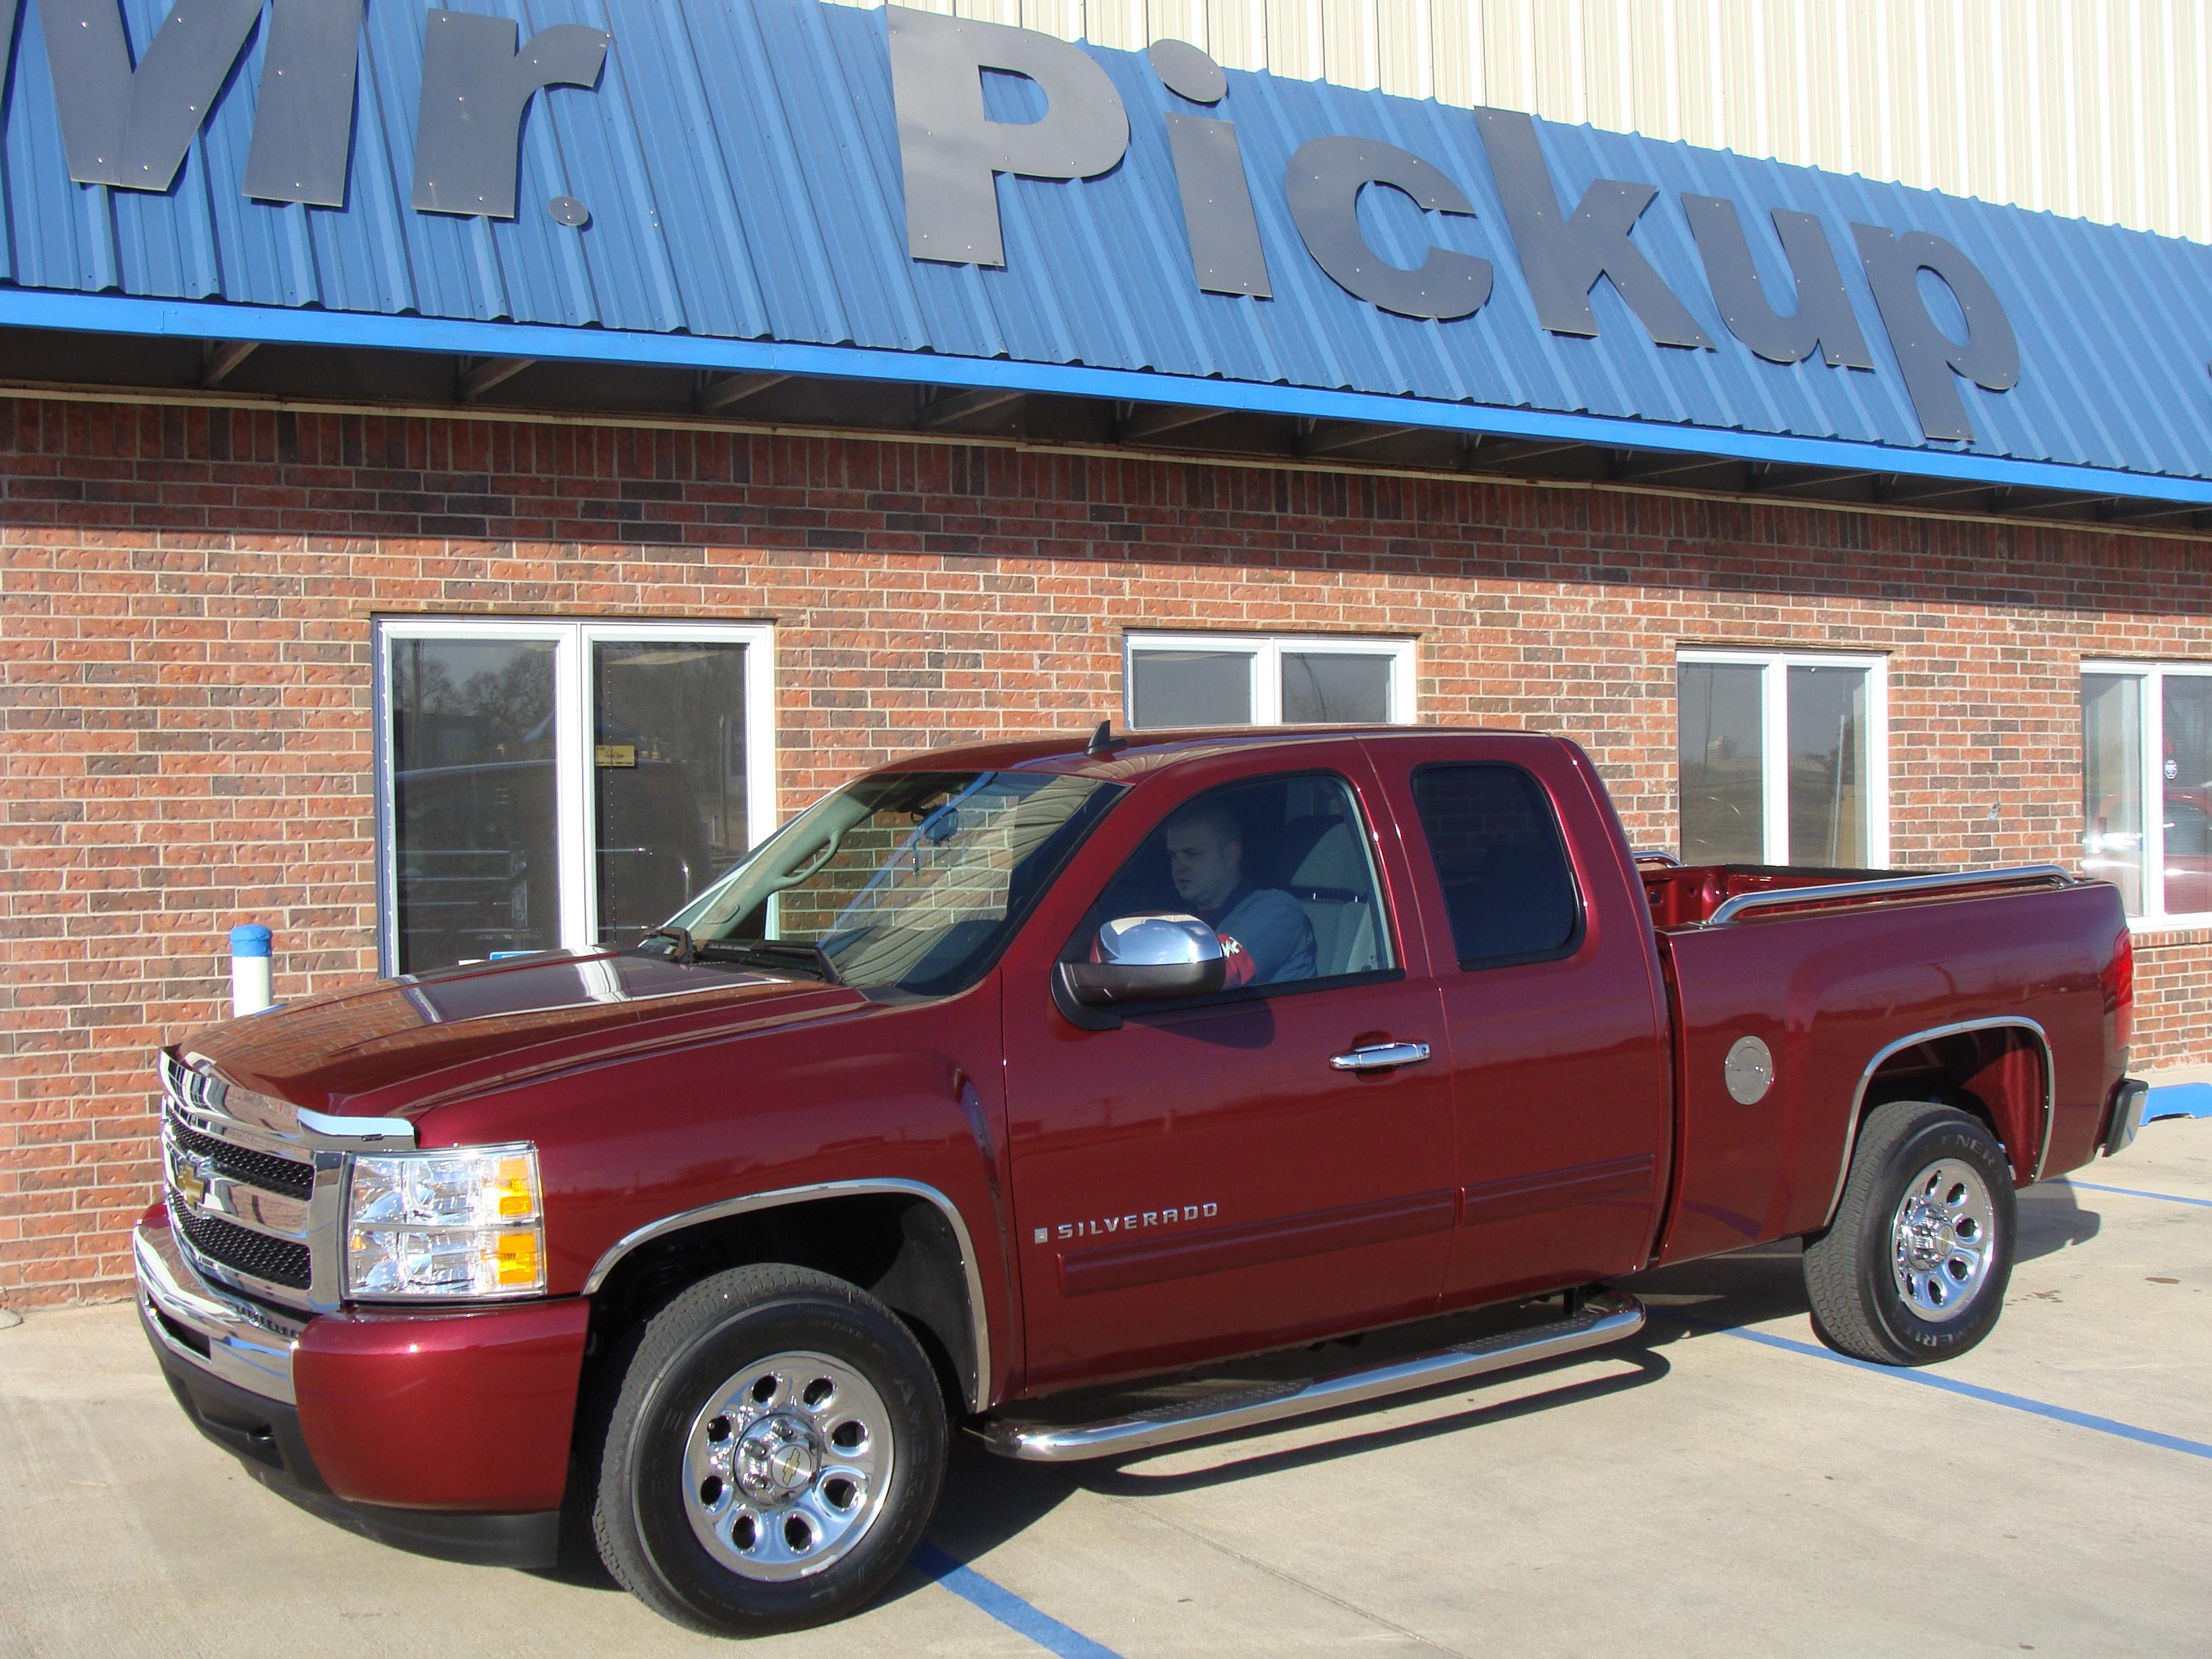 Mr Pickup Distributing 809 S Agnew Ave Oklahoma City OK